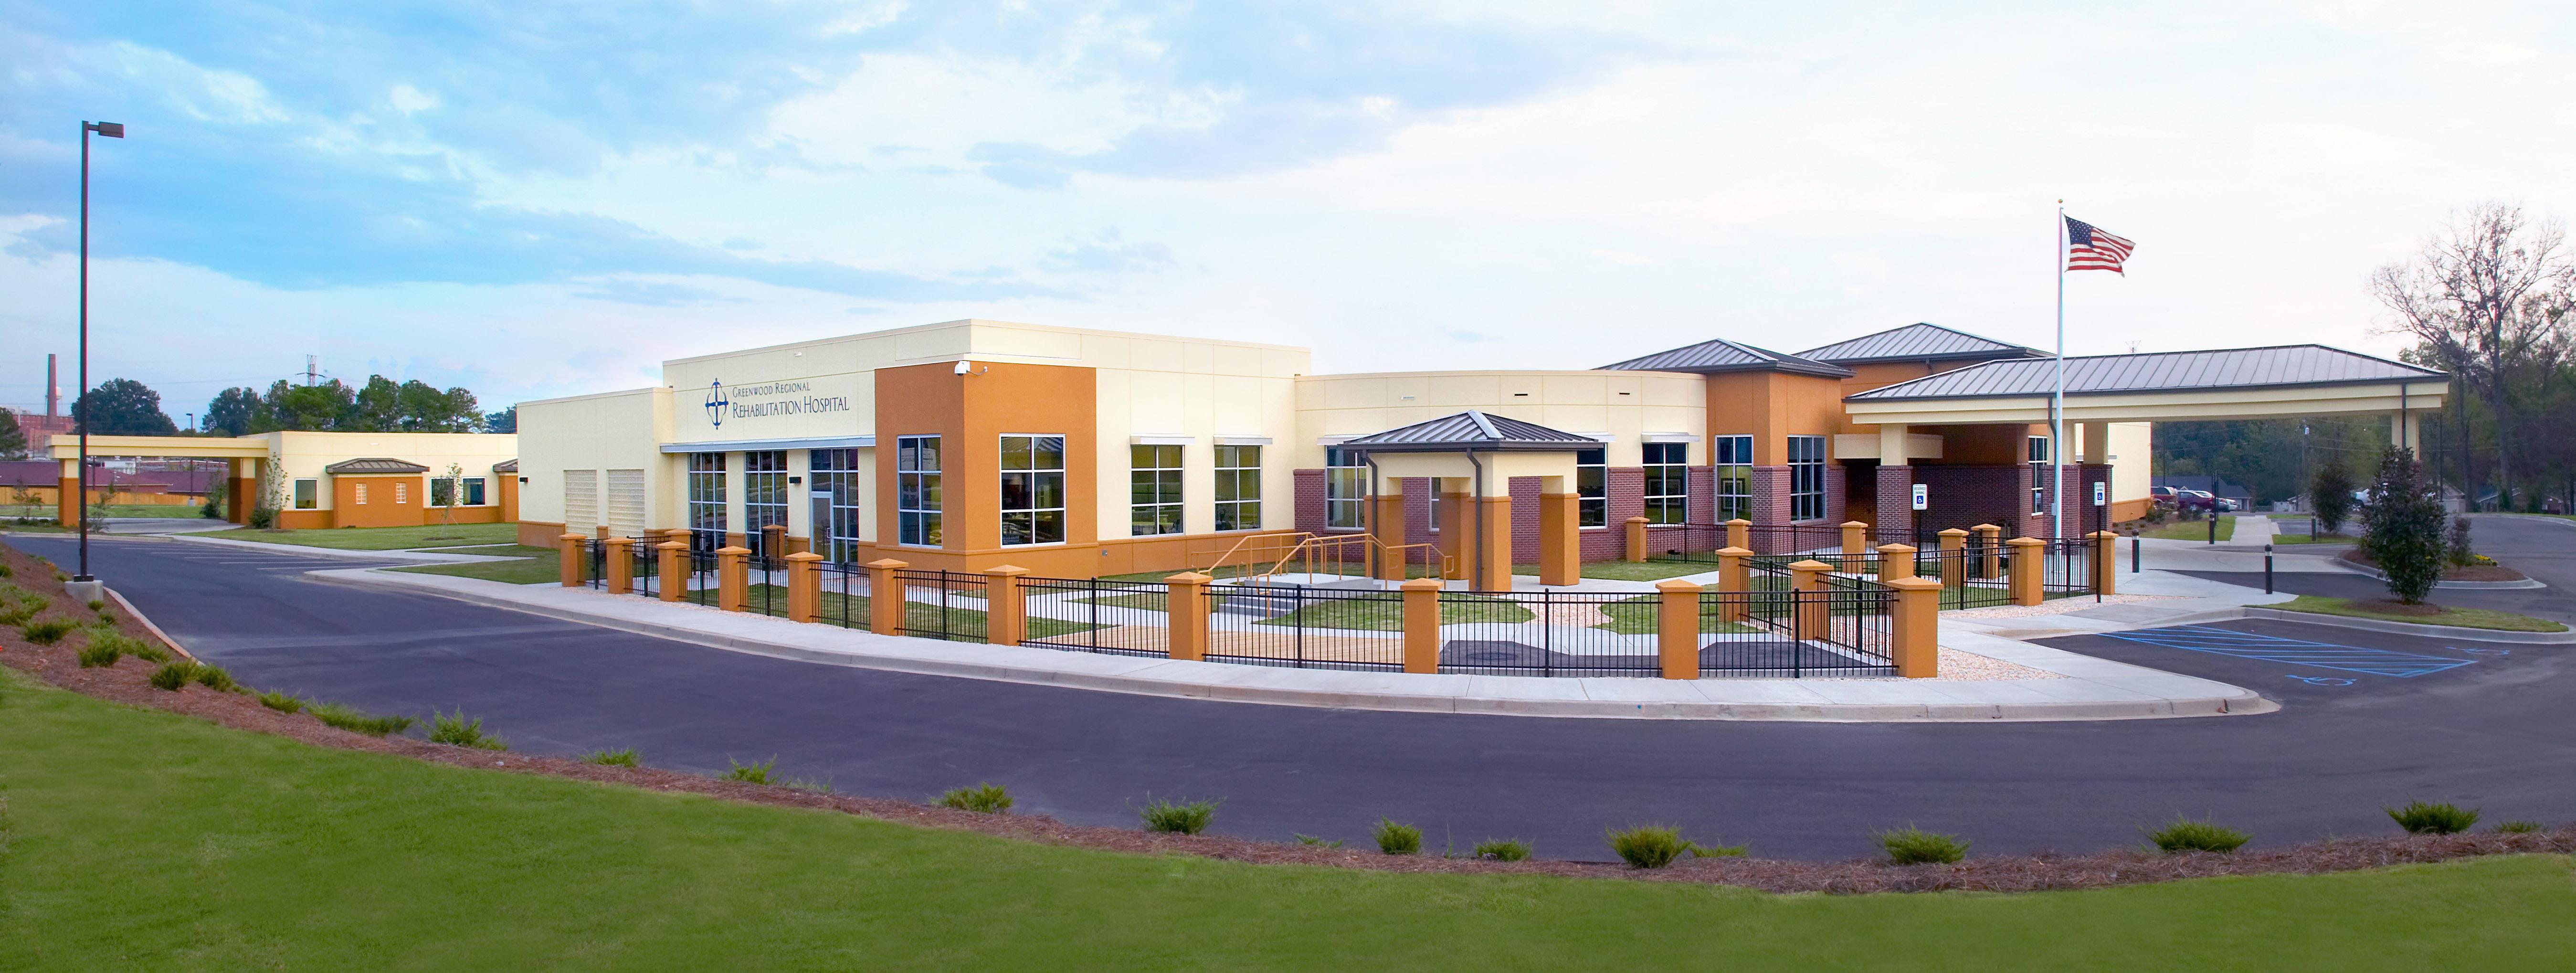 Greenwood Regional Rehabilitation Hospital reviews | Hospitals at 1530 Parkway Road - Greenwood SC